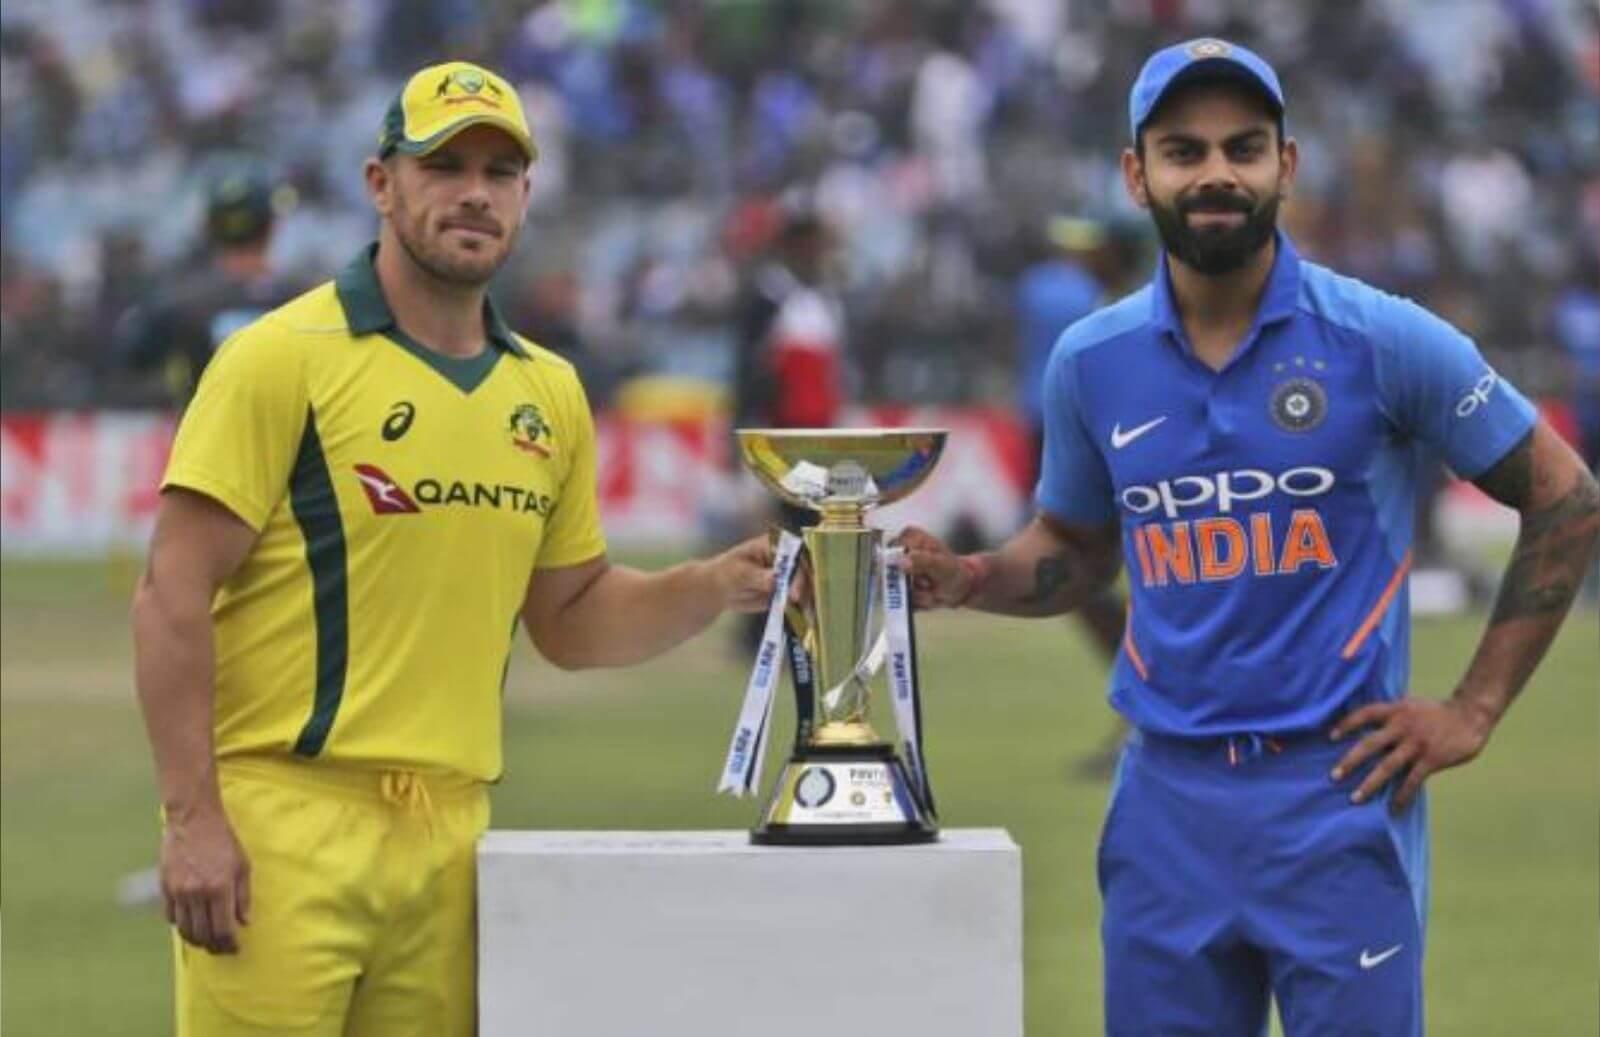 IND-vs-AUS_-Idiot-Bruce-Oxenford-Team-India-'Robbed'-As-Fans-Slammed-Umpiring-Howler-On-Social-Media